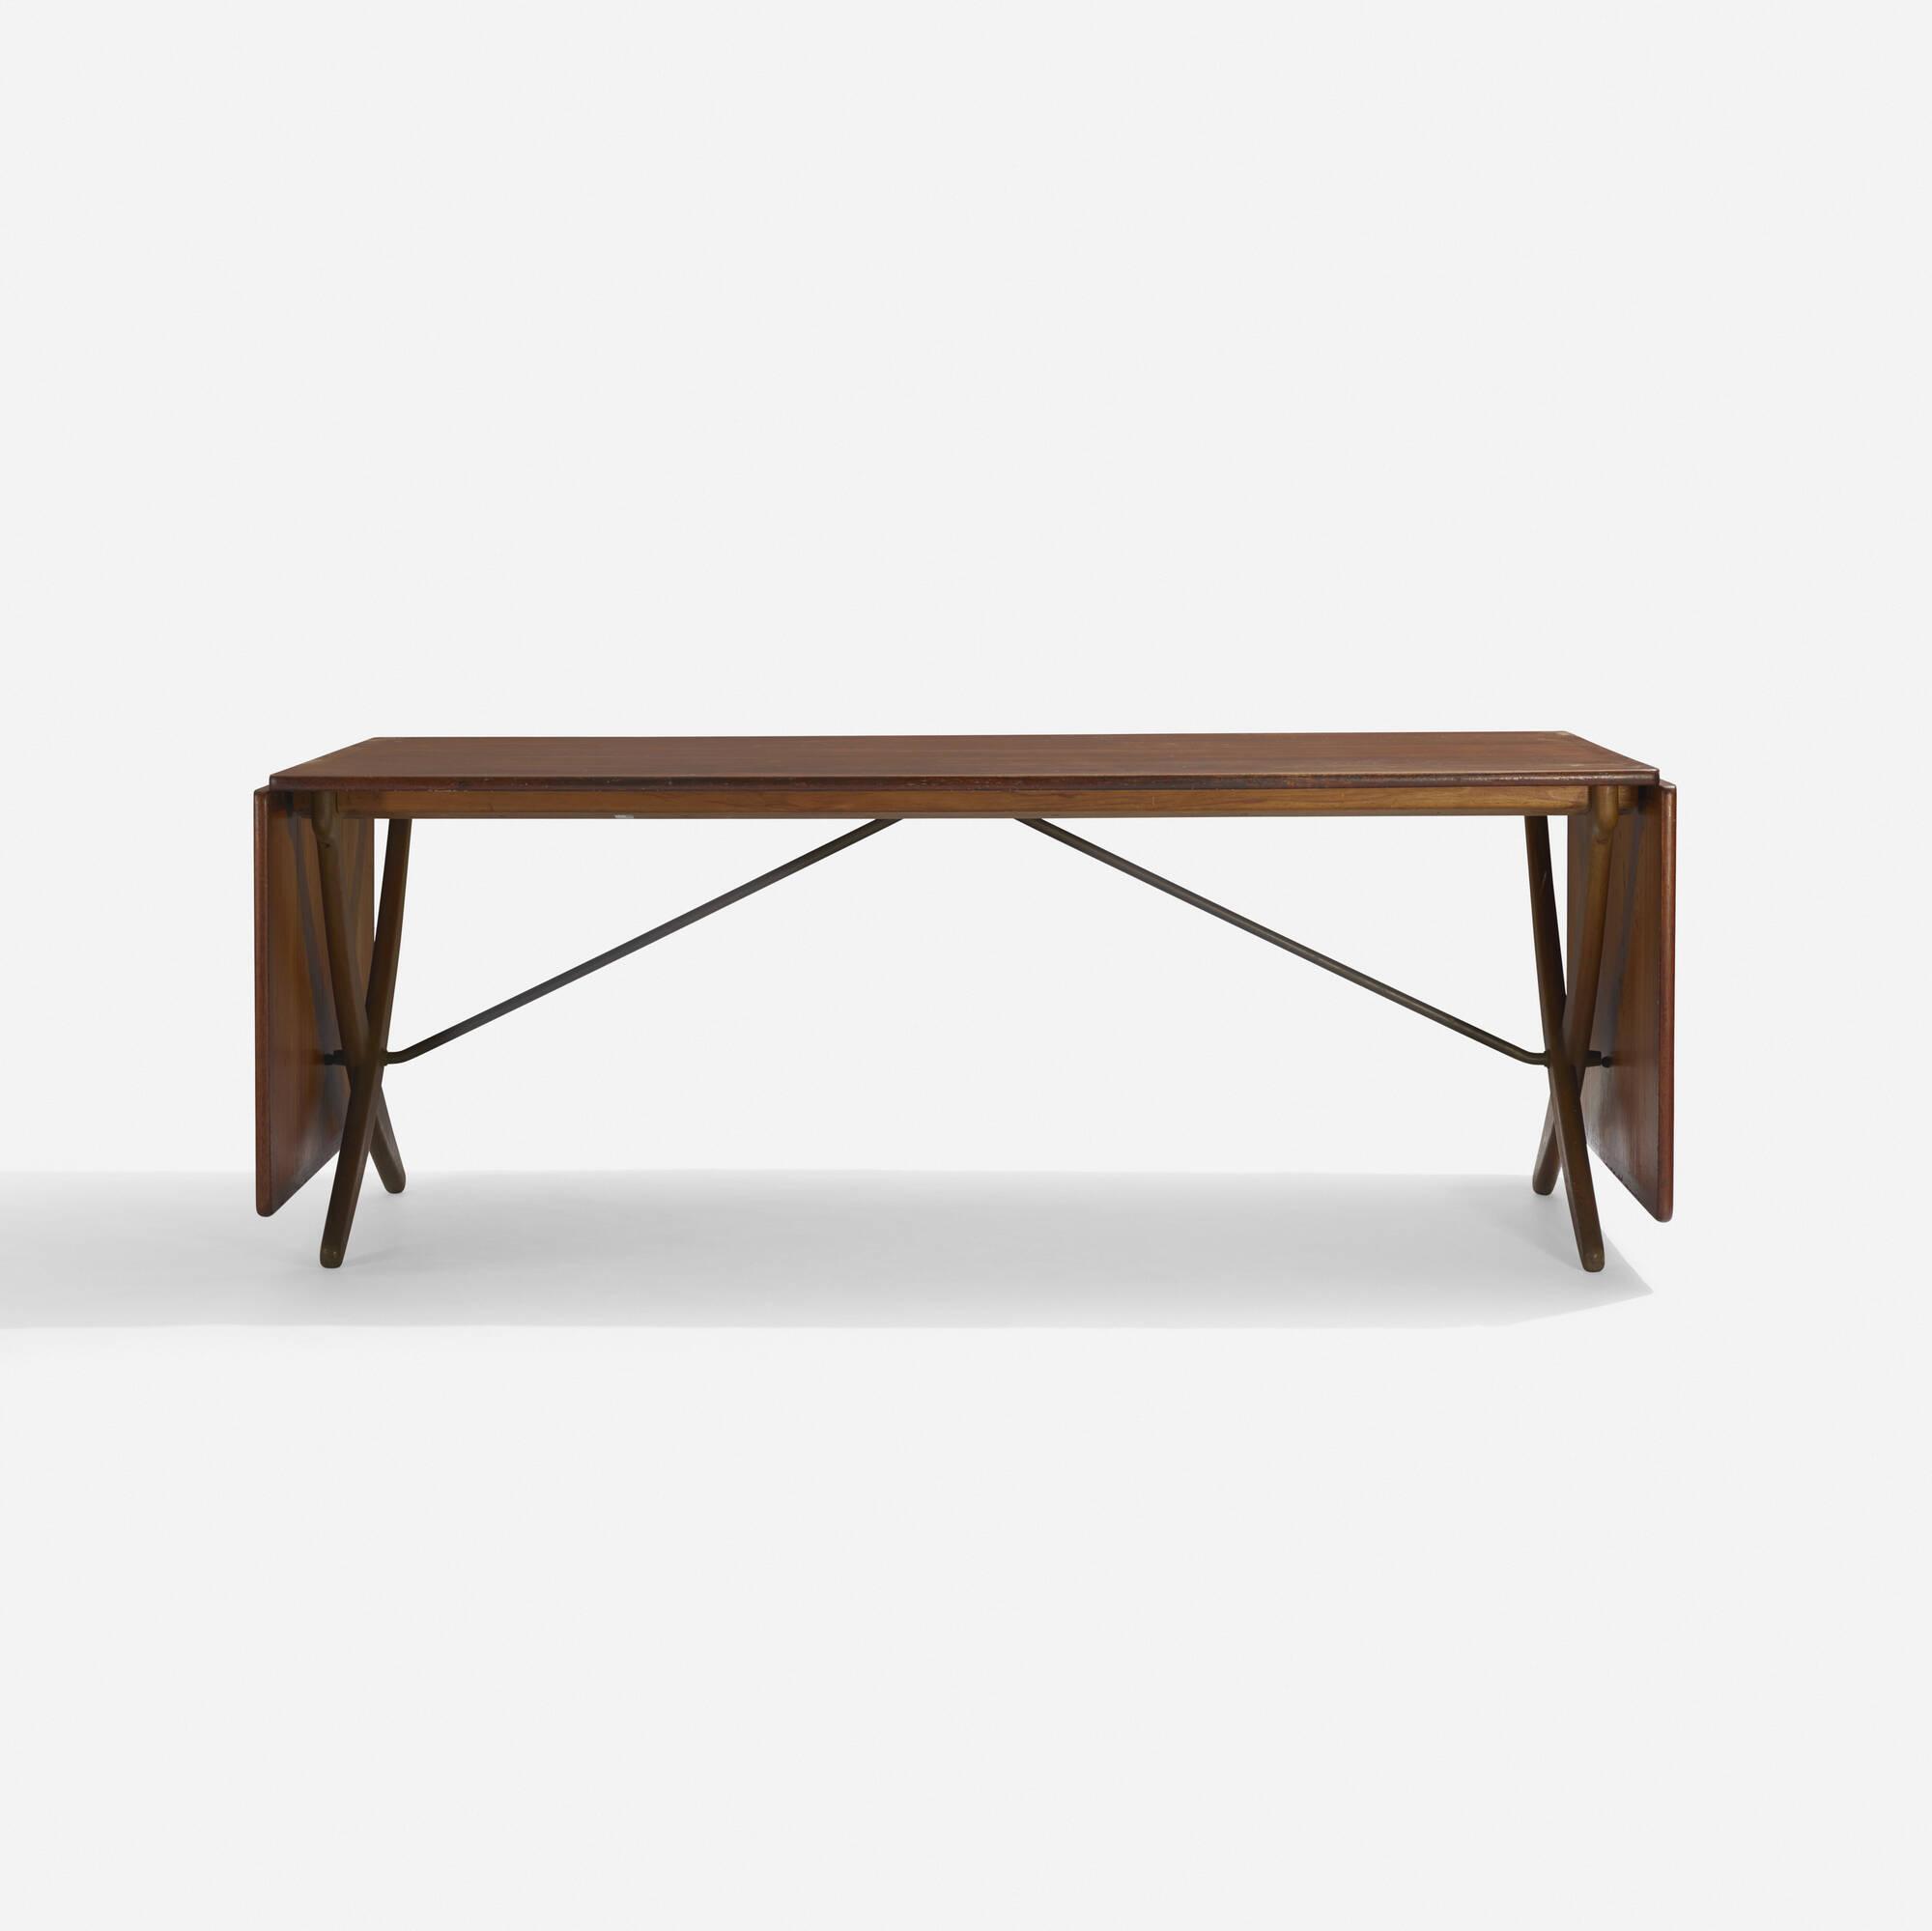 101: Hans J. Wegner / drop-leaf dining table, model AT304 (2 of 3)